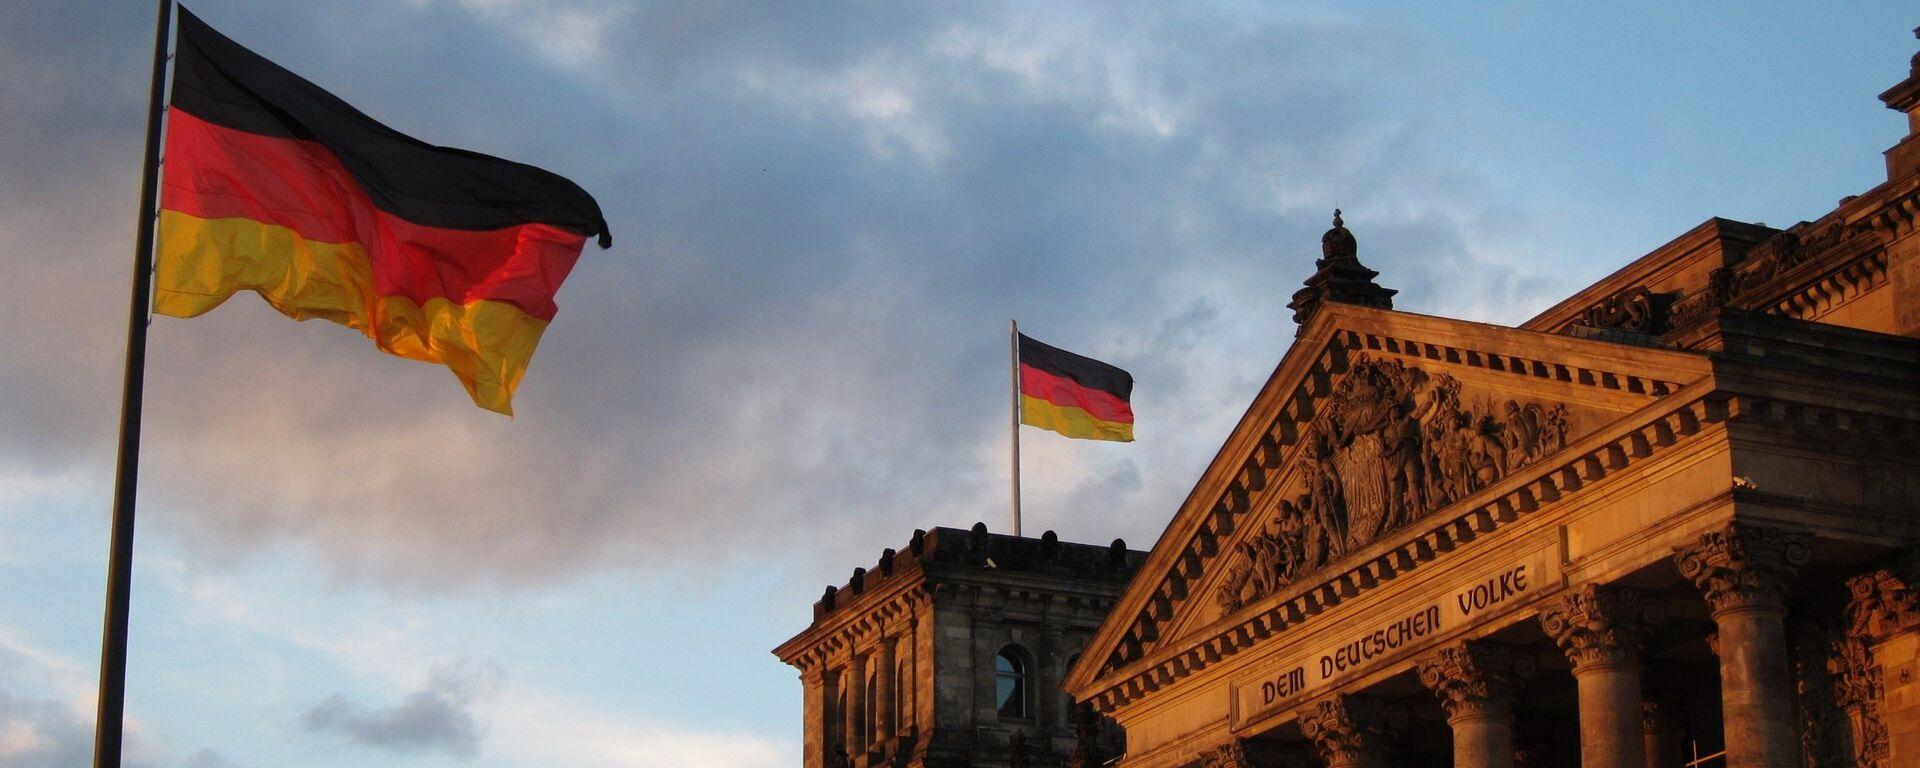 Bandera de Alemania - Sputnik Mundo, 1920, 13.02.2020